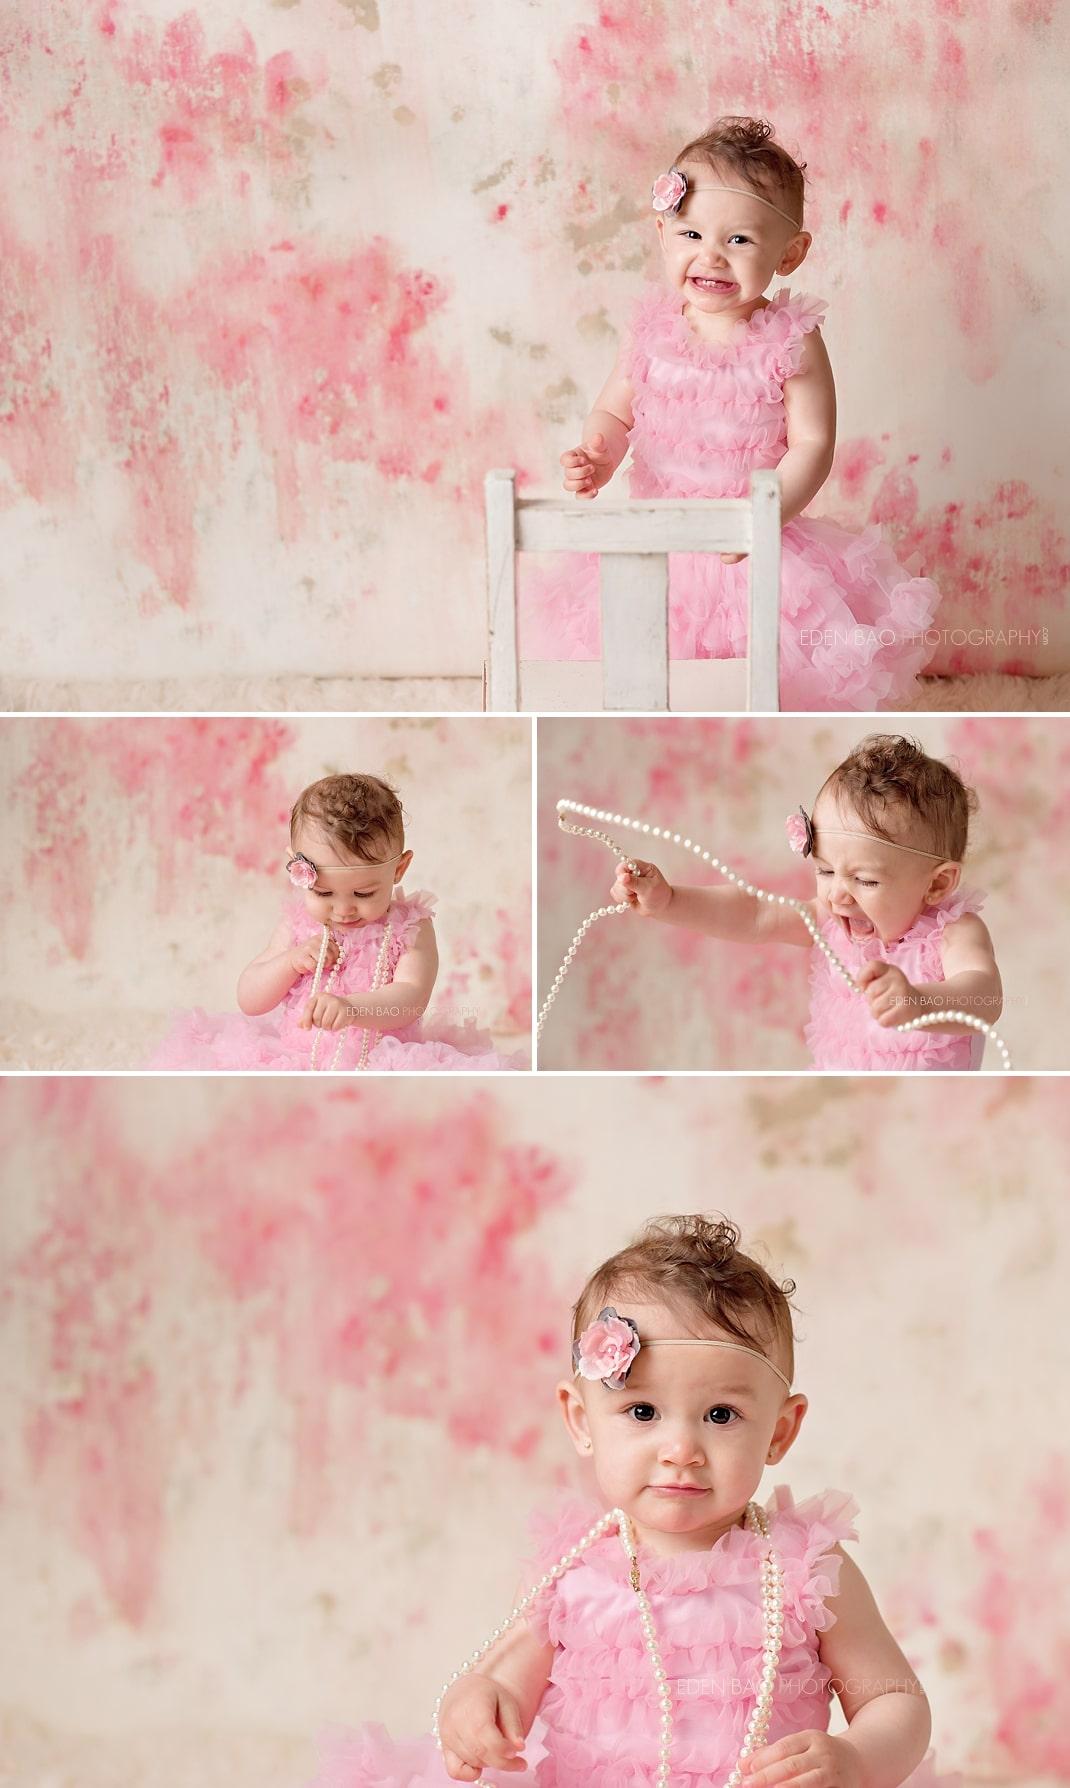 Surrey Vancouver BC Baby Photographer 1 year portrait pink floral backdrop dress